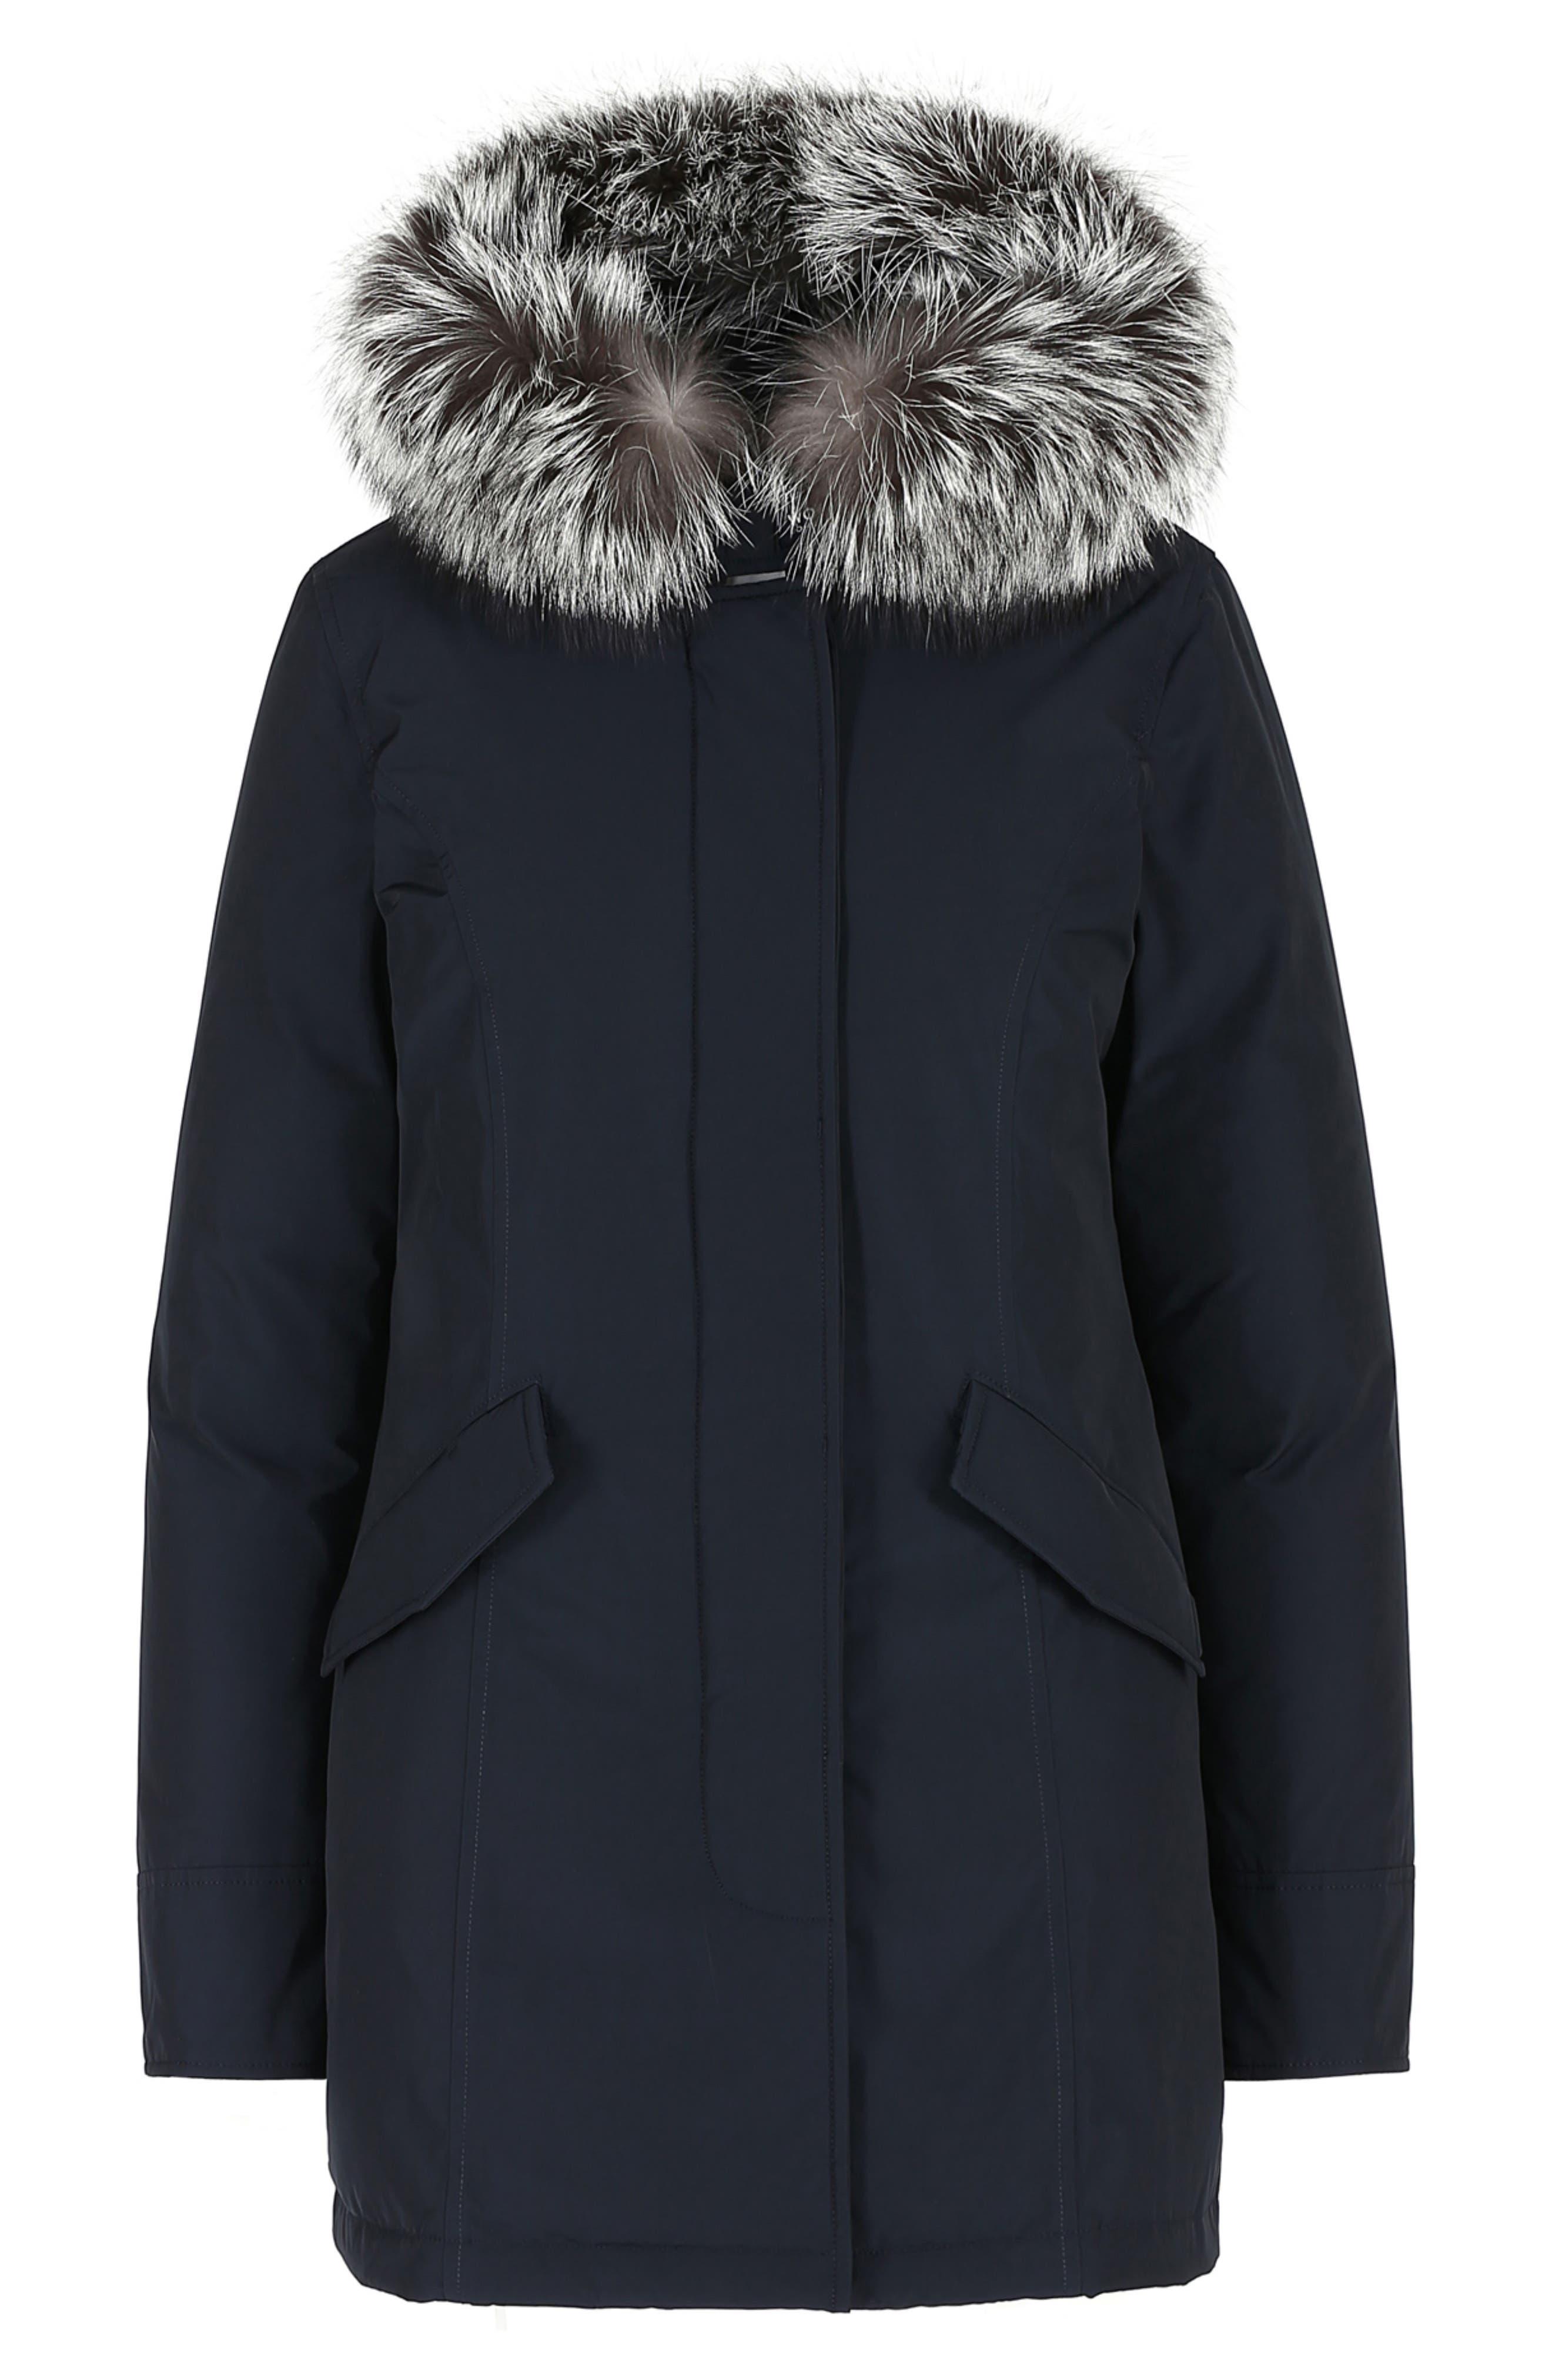 Luxury Arctic Down Parka with Genuine Fox Fur Trim,                             Alternate thumbnail 5, color,                             MIDNIGHT BLUE